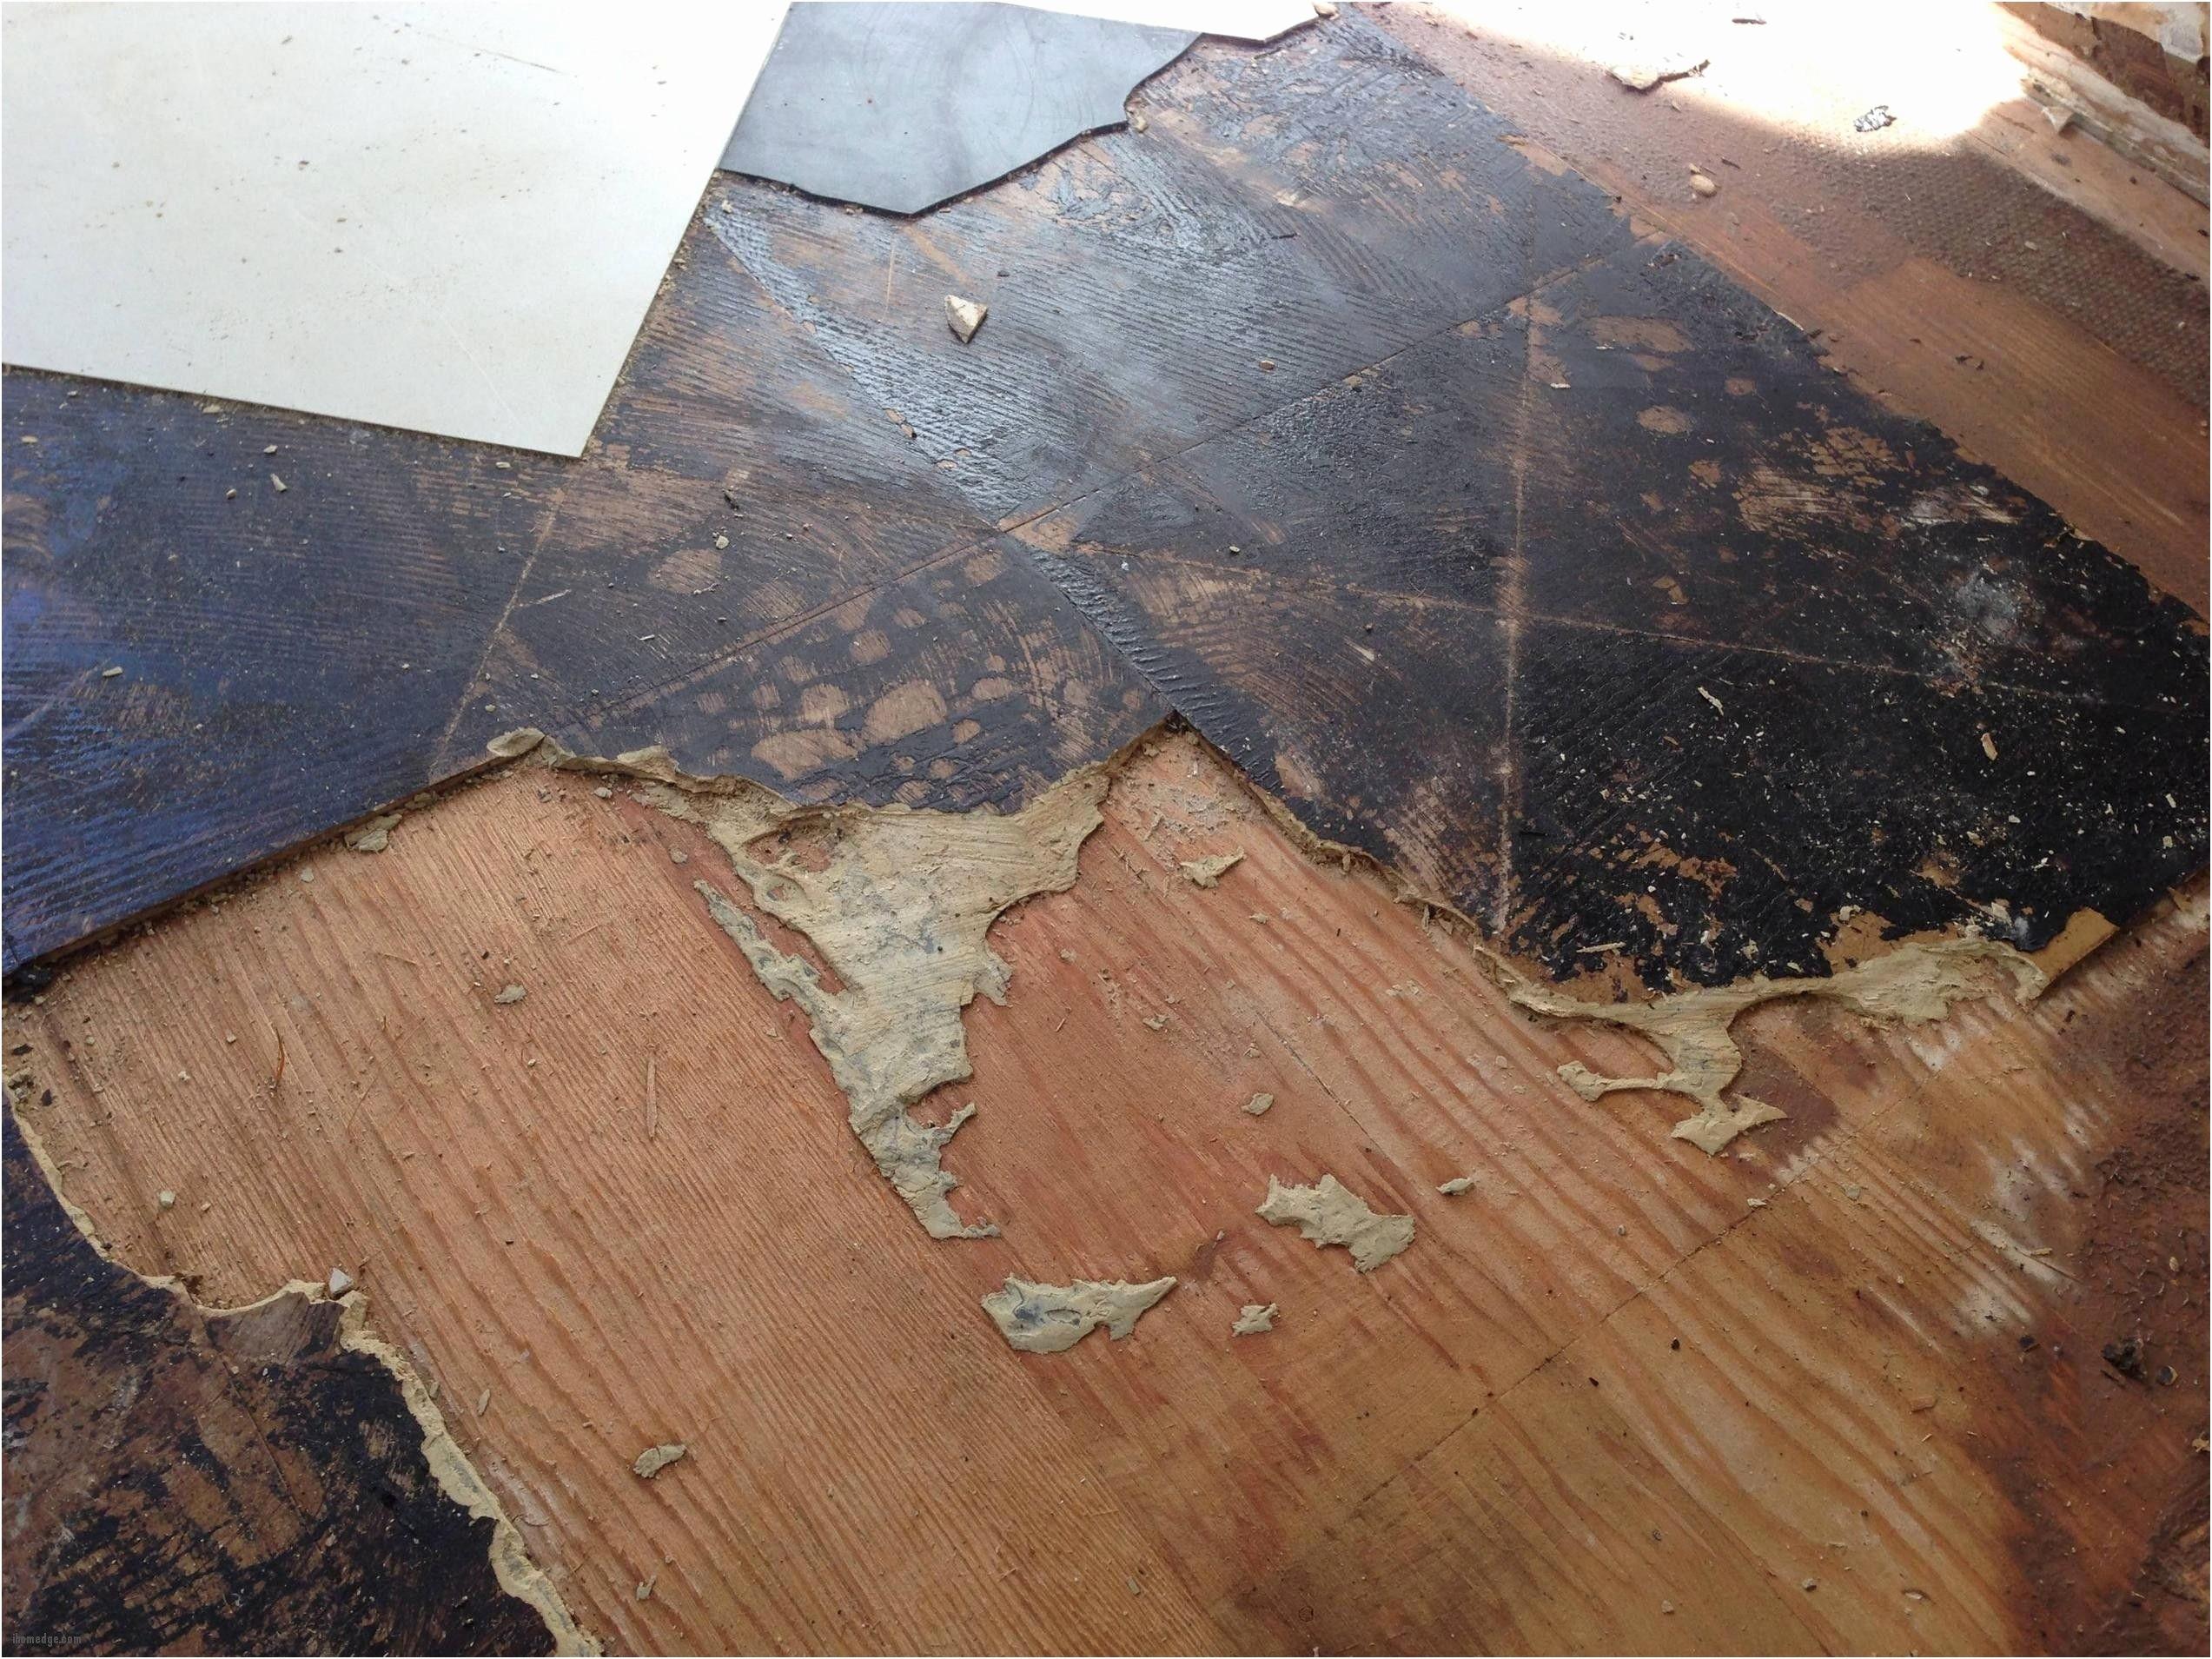 7 hardwood flooring of 19 awesome hardwood flooring for sale photograph dizpos com inside hardwood flooring for sale fresh 50 new vinyl flooring sale pics 50 s image of 19